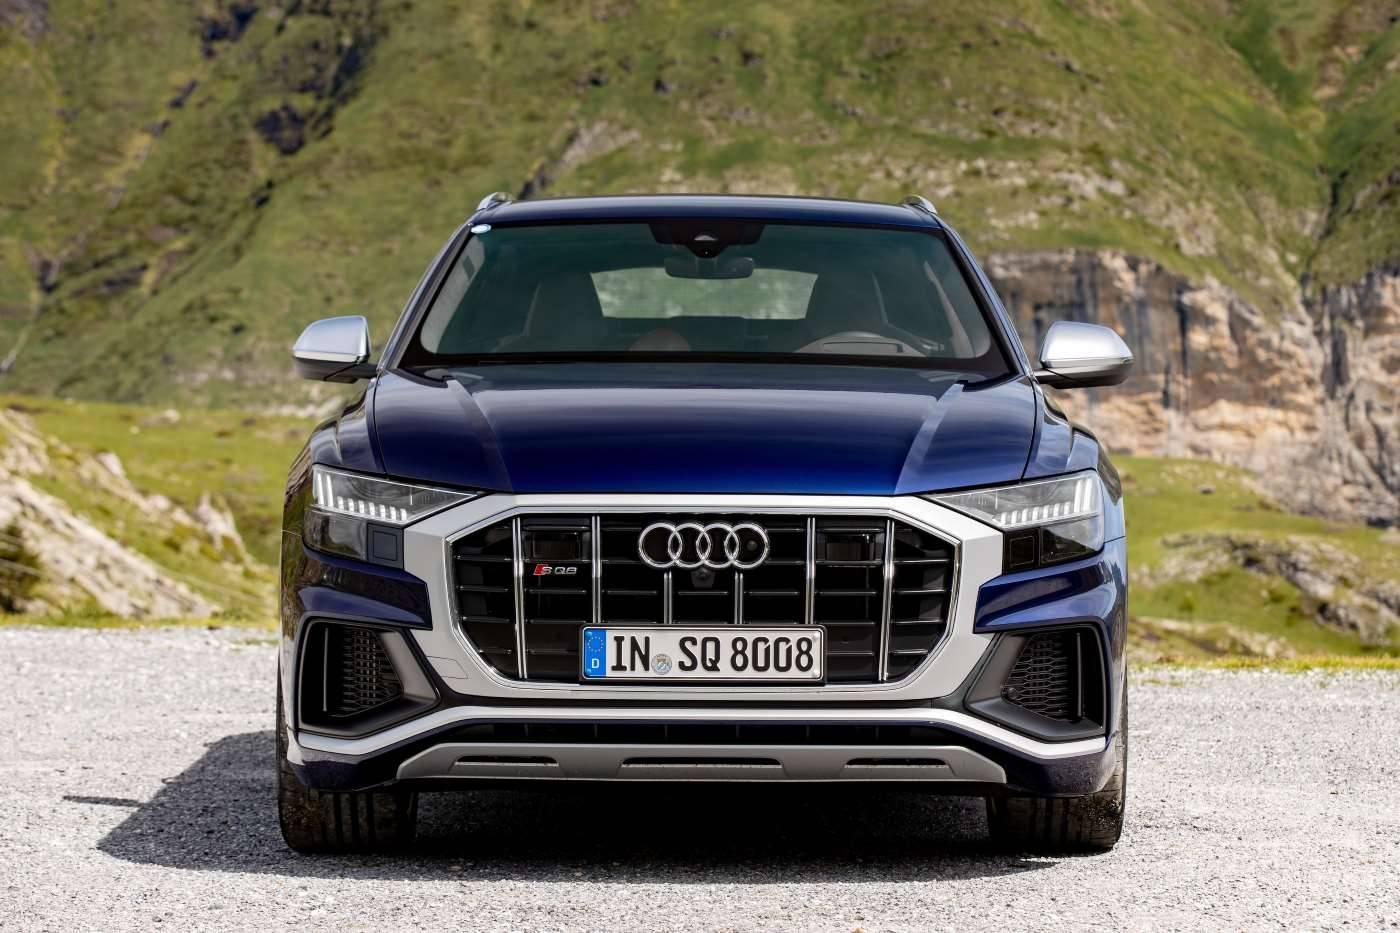 Nouvelle Audi SQ8 TDI 2019 2020 face avant bleu